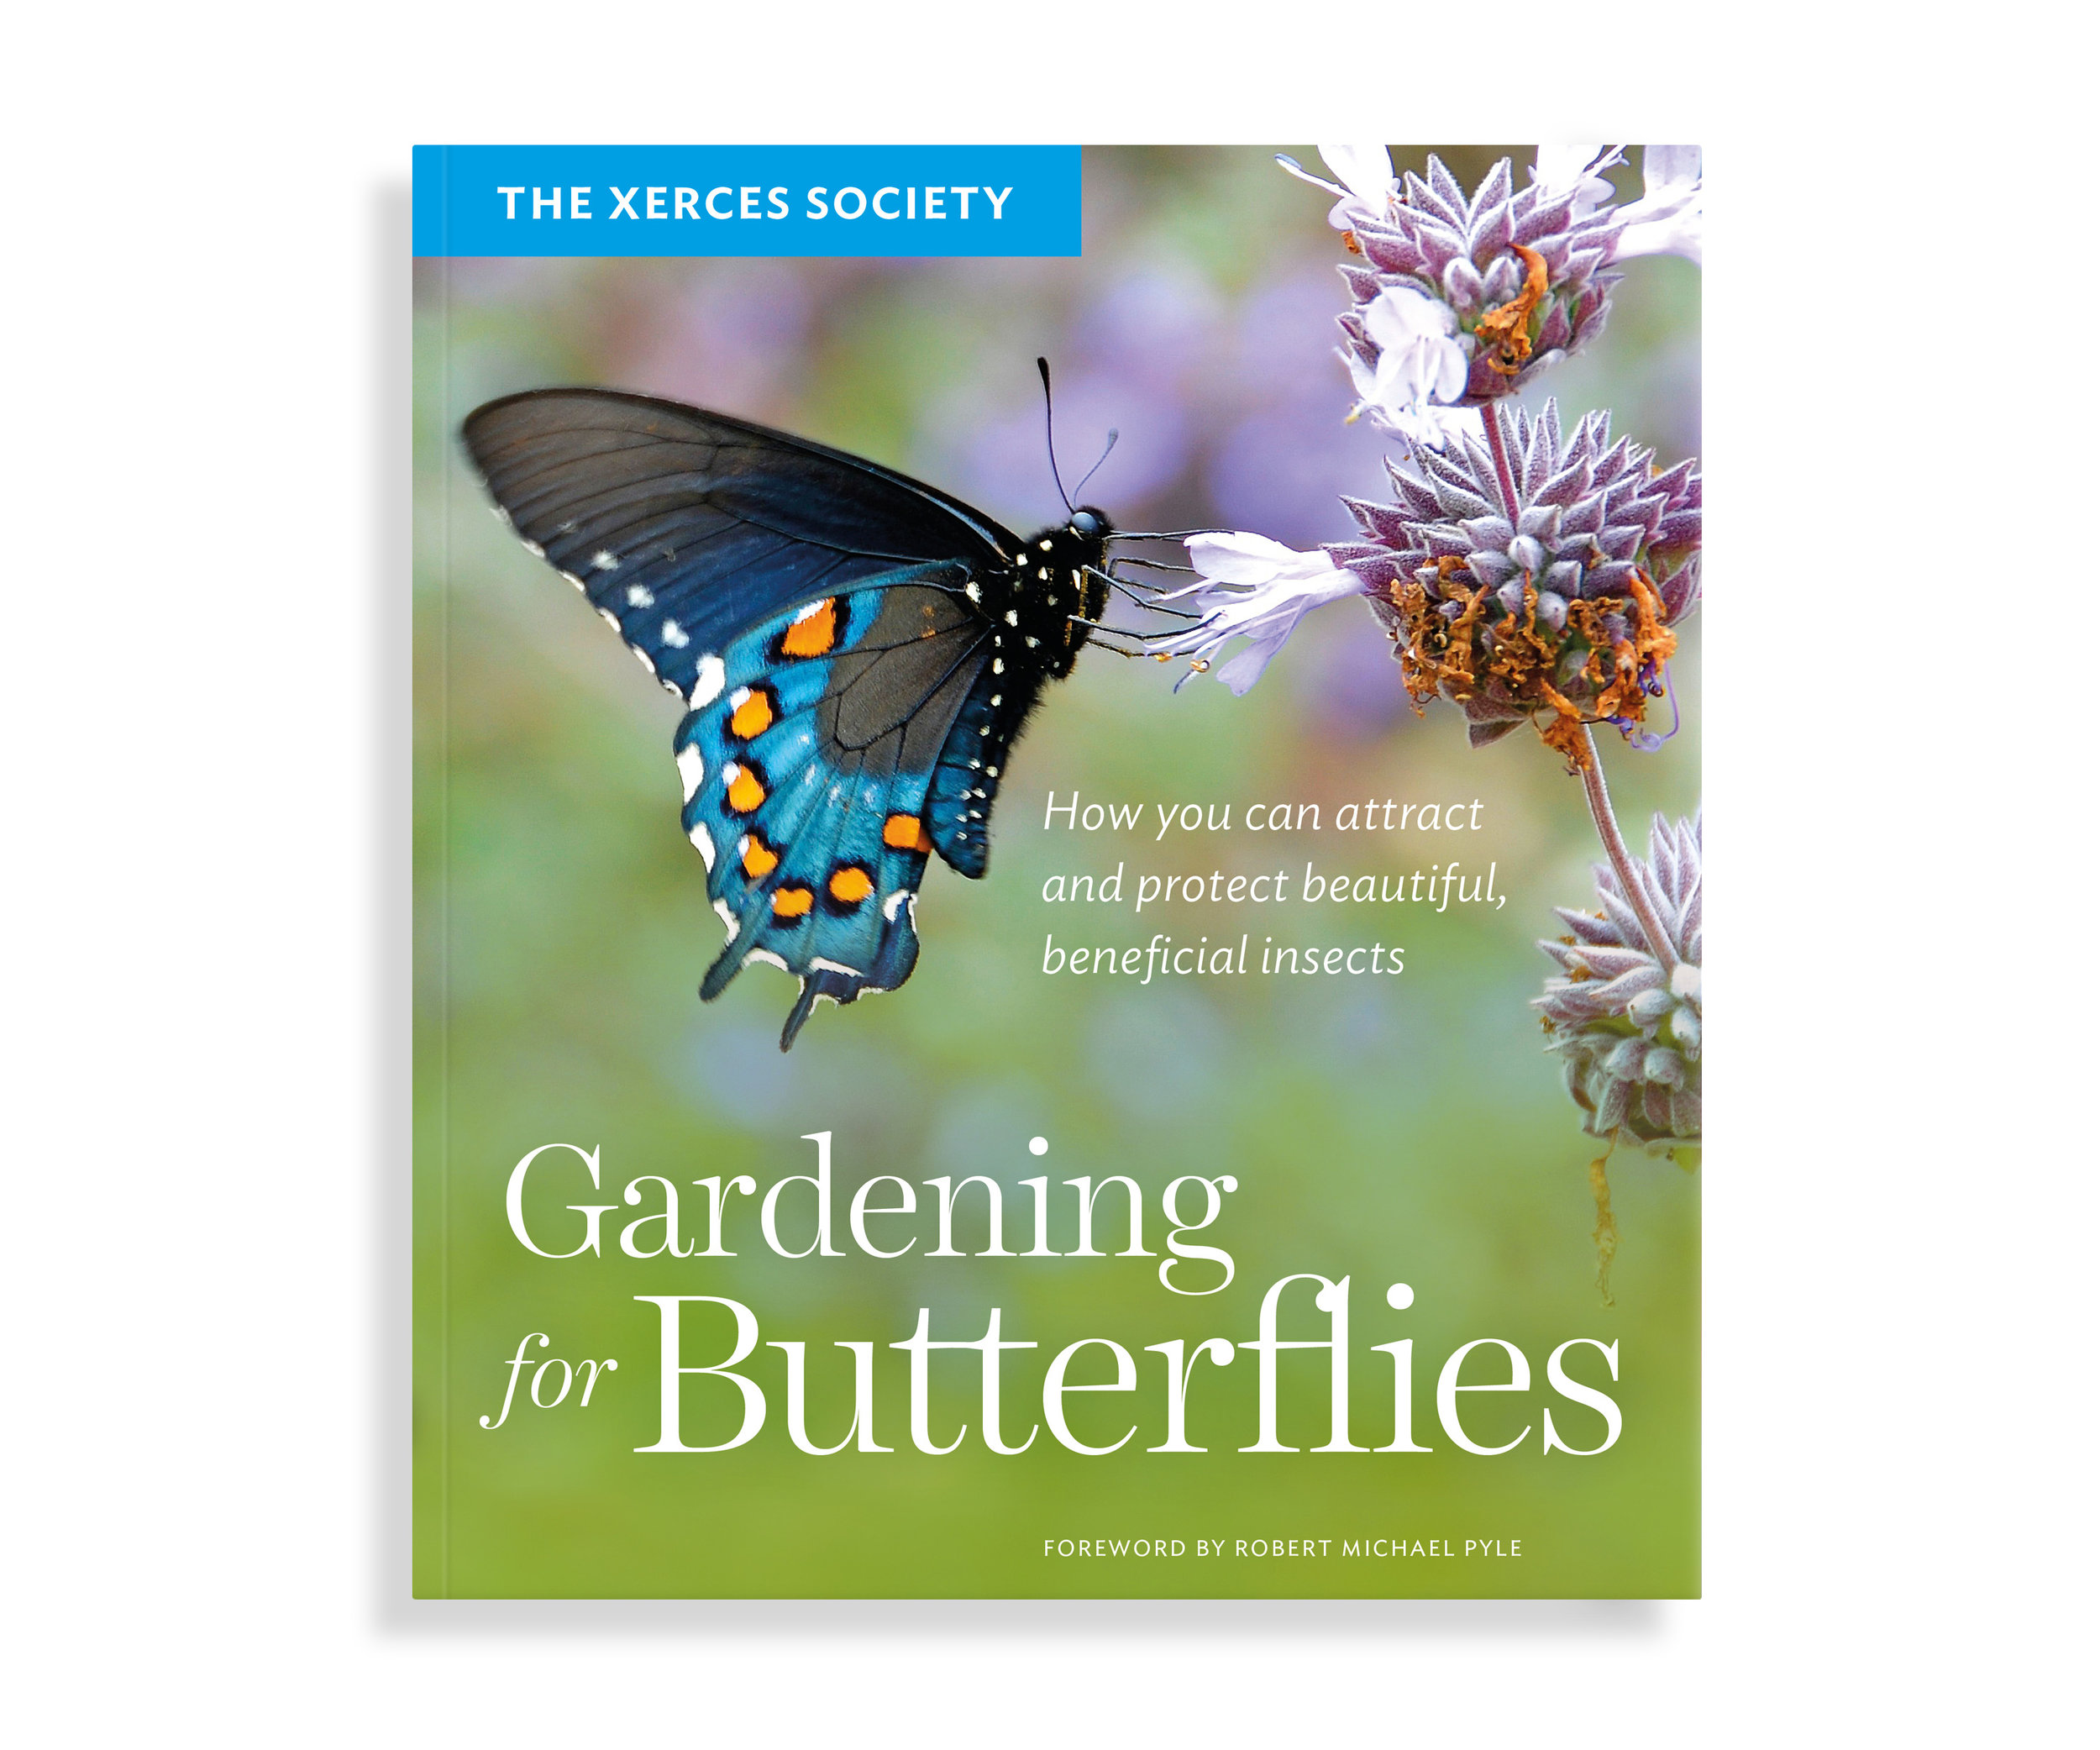 book_butterflygardening_cover_001.jpg